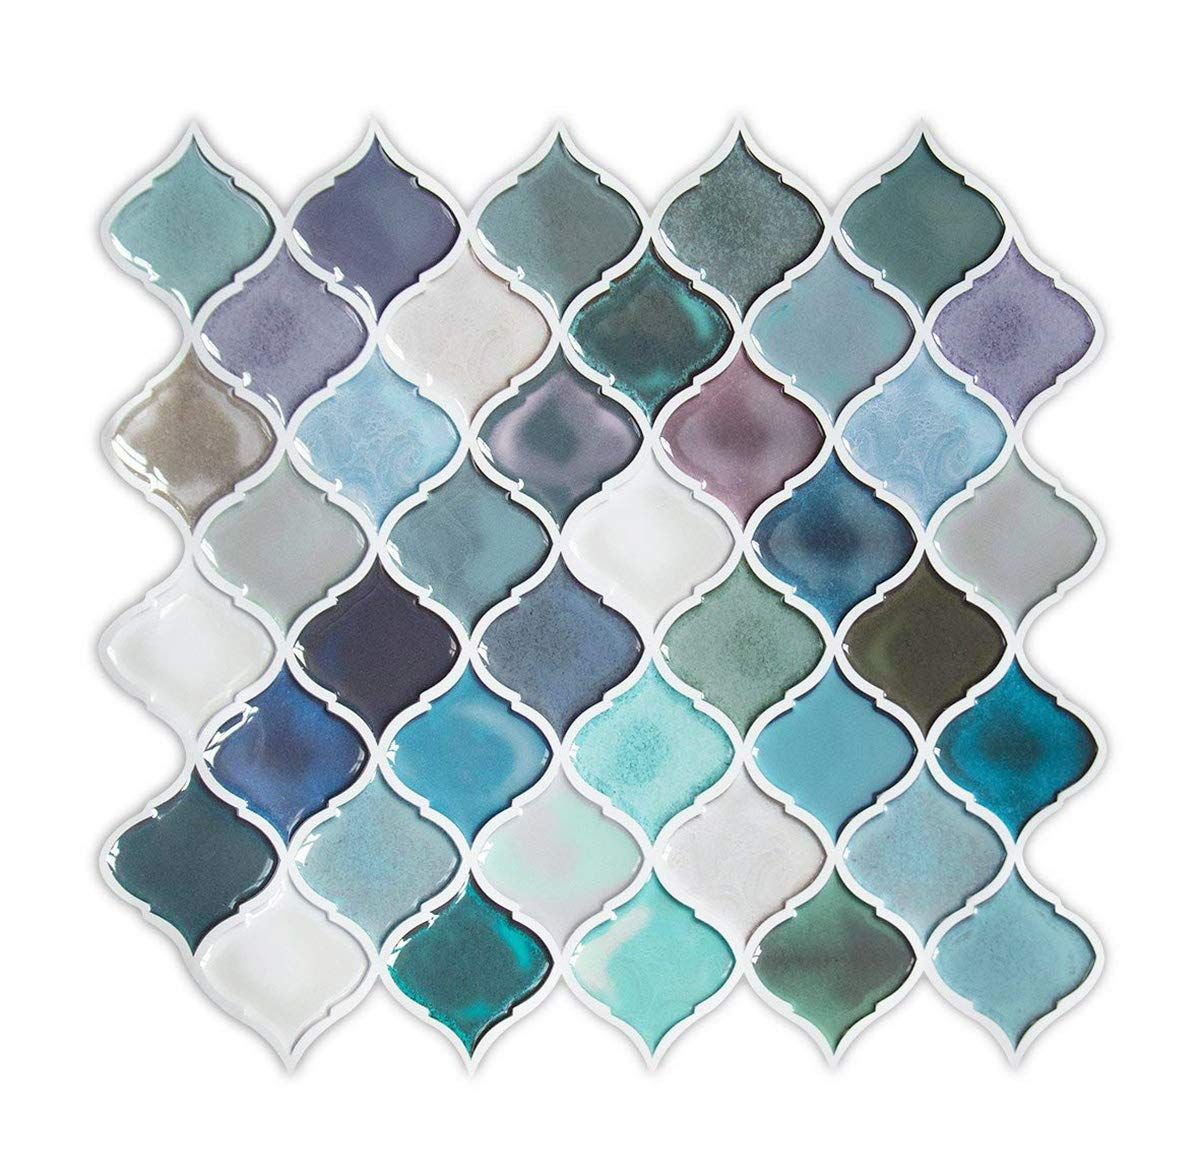 Self Adhesive Tile Splashback Peel And Stick Tiles Backsplash For